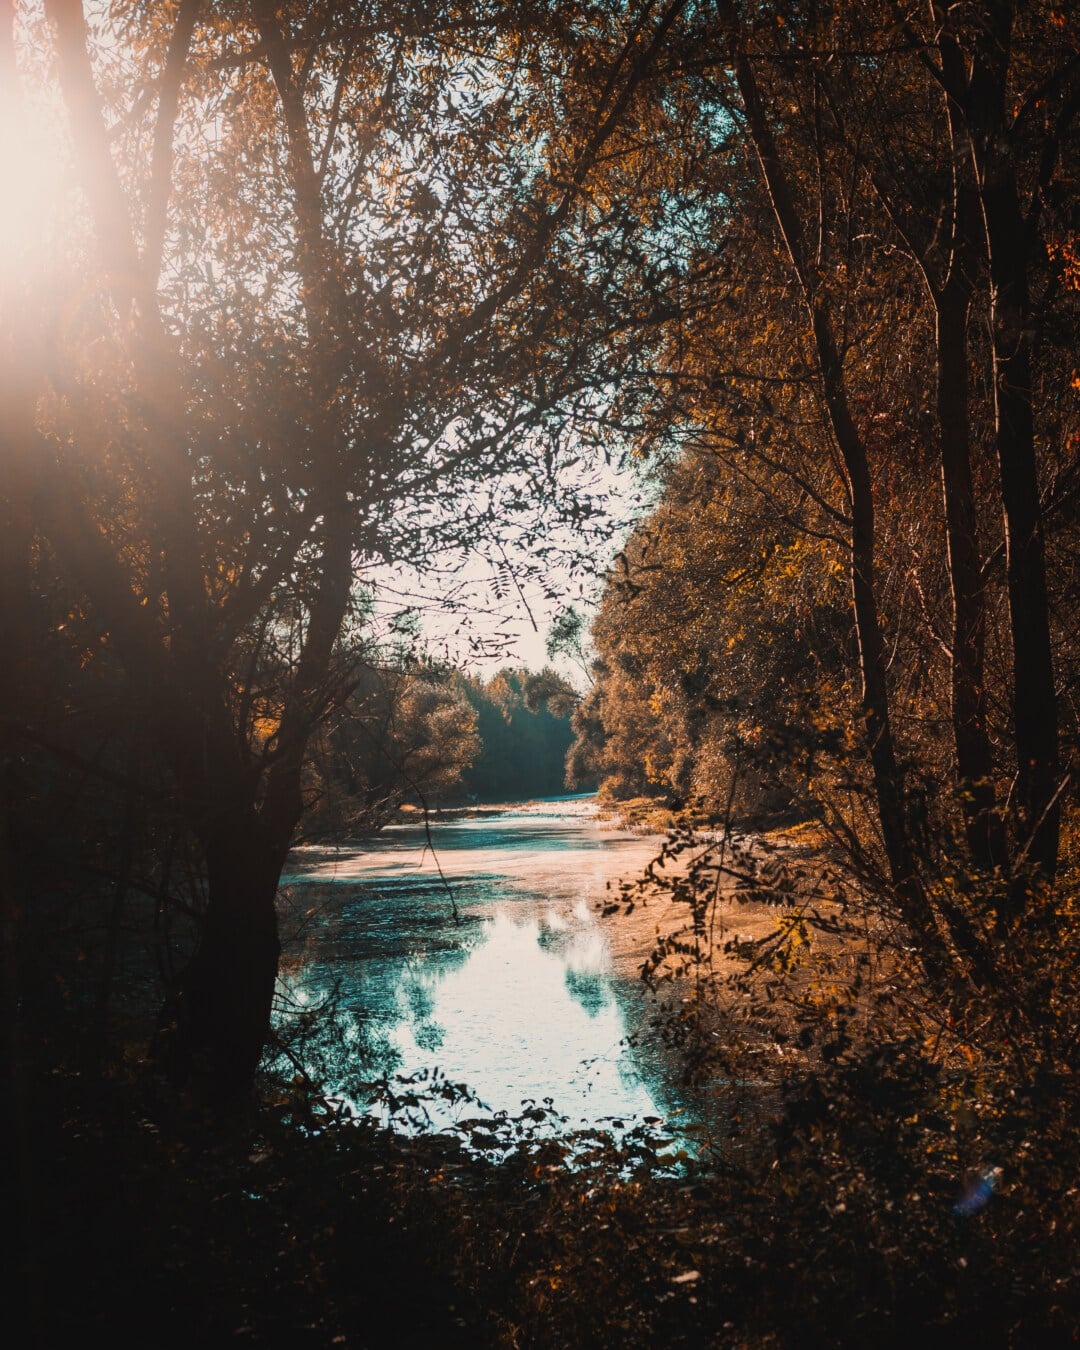 Sonnenstrahlen, sonnig, am See, Sumpf, Herbstsaison, majestätisch, Bäume, Fluss, Wald, Sonnenuntergang